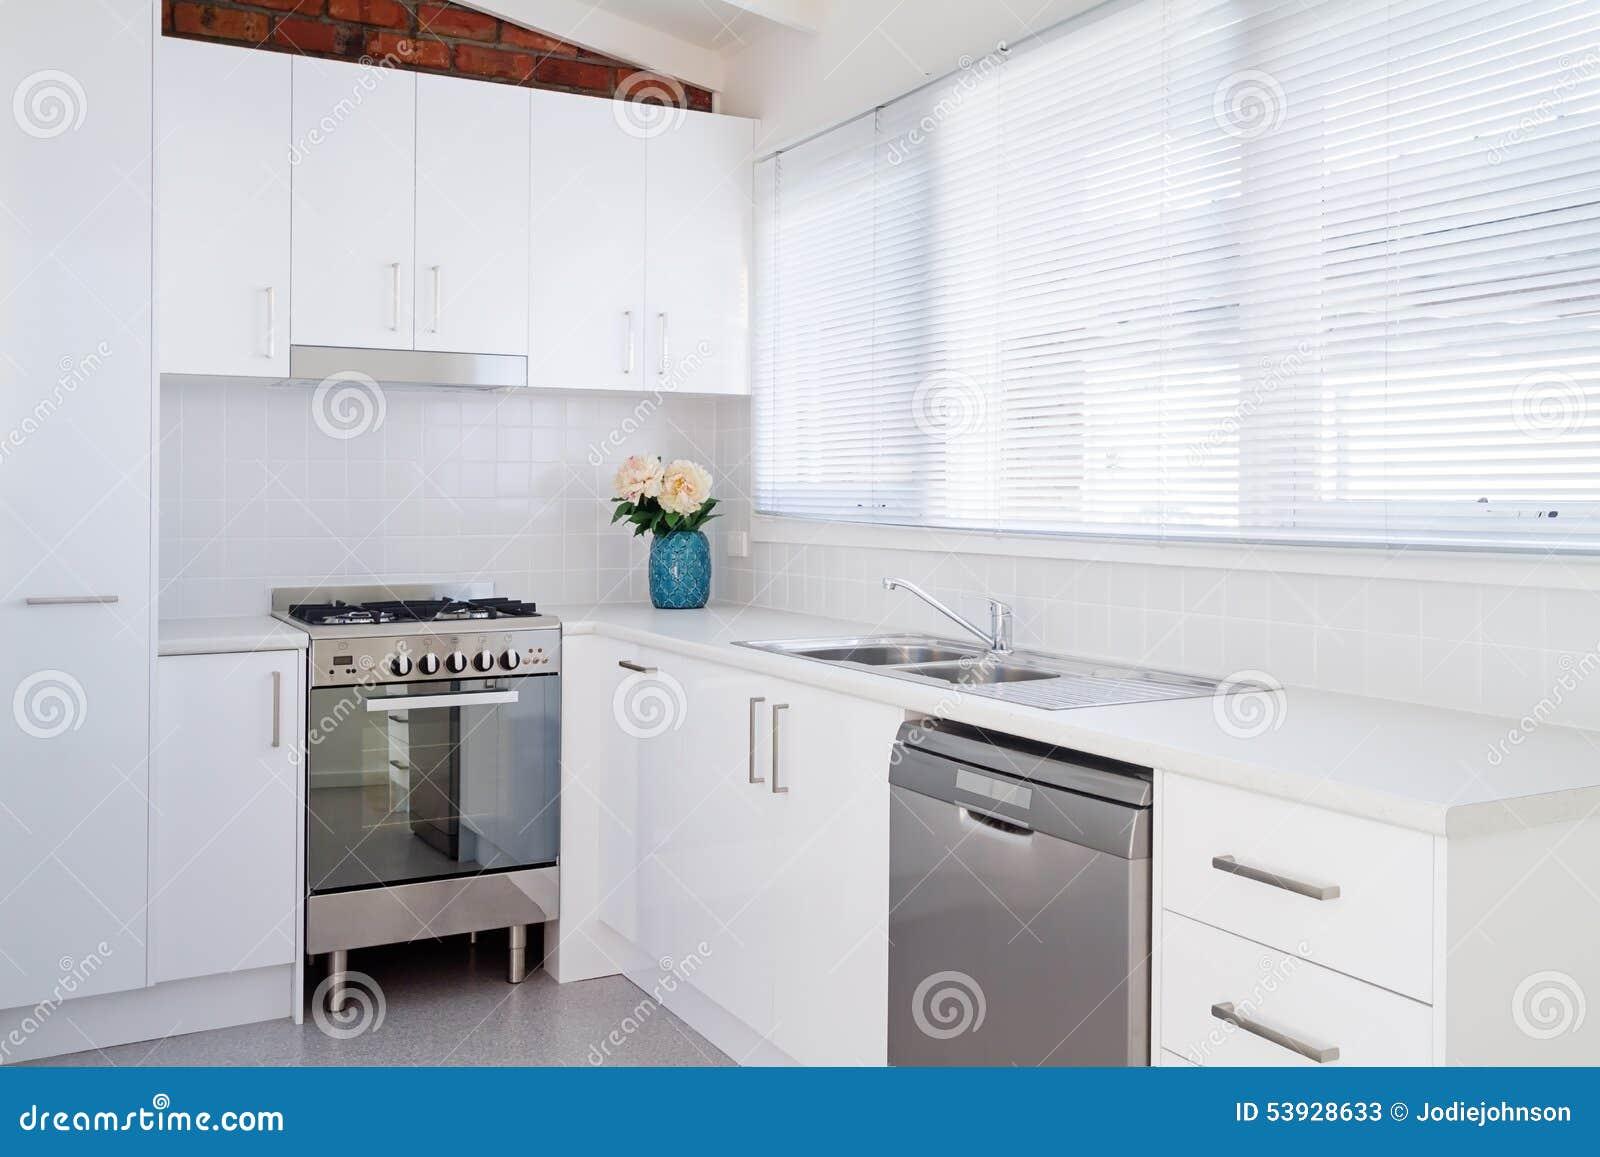 Cuisine moderne blanche lumineuse d 39 appartement image for Cuisine moderne appartement